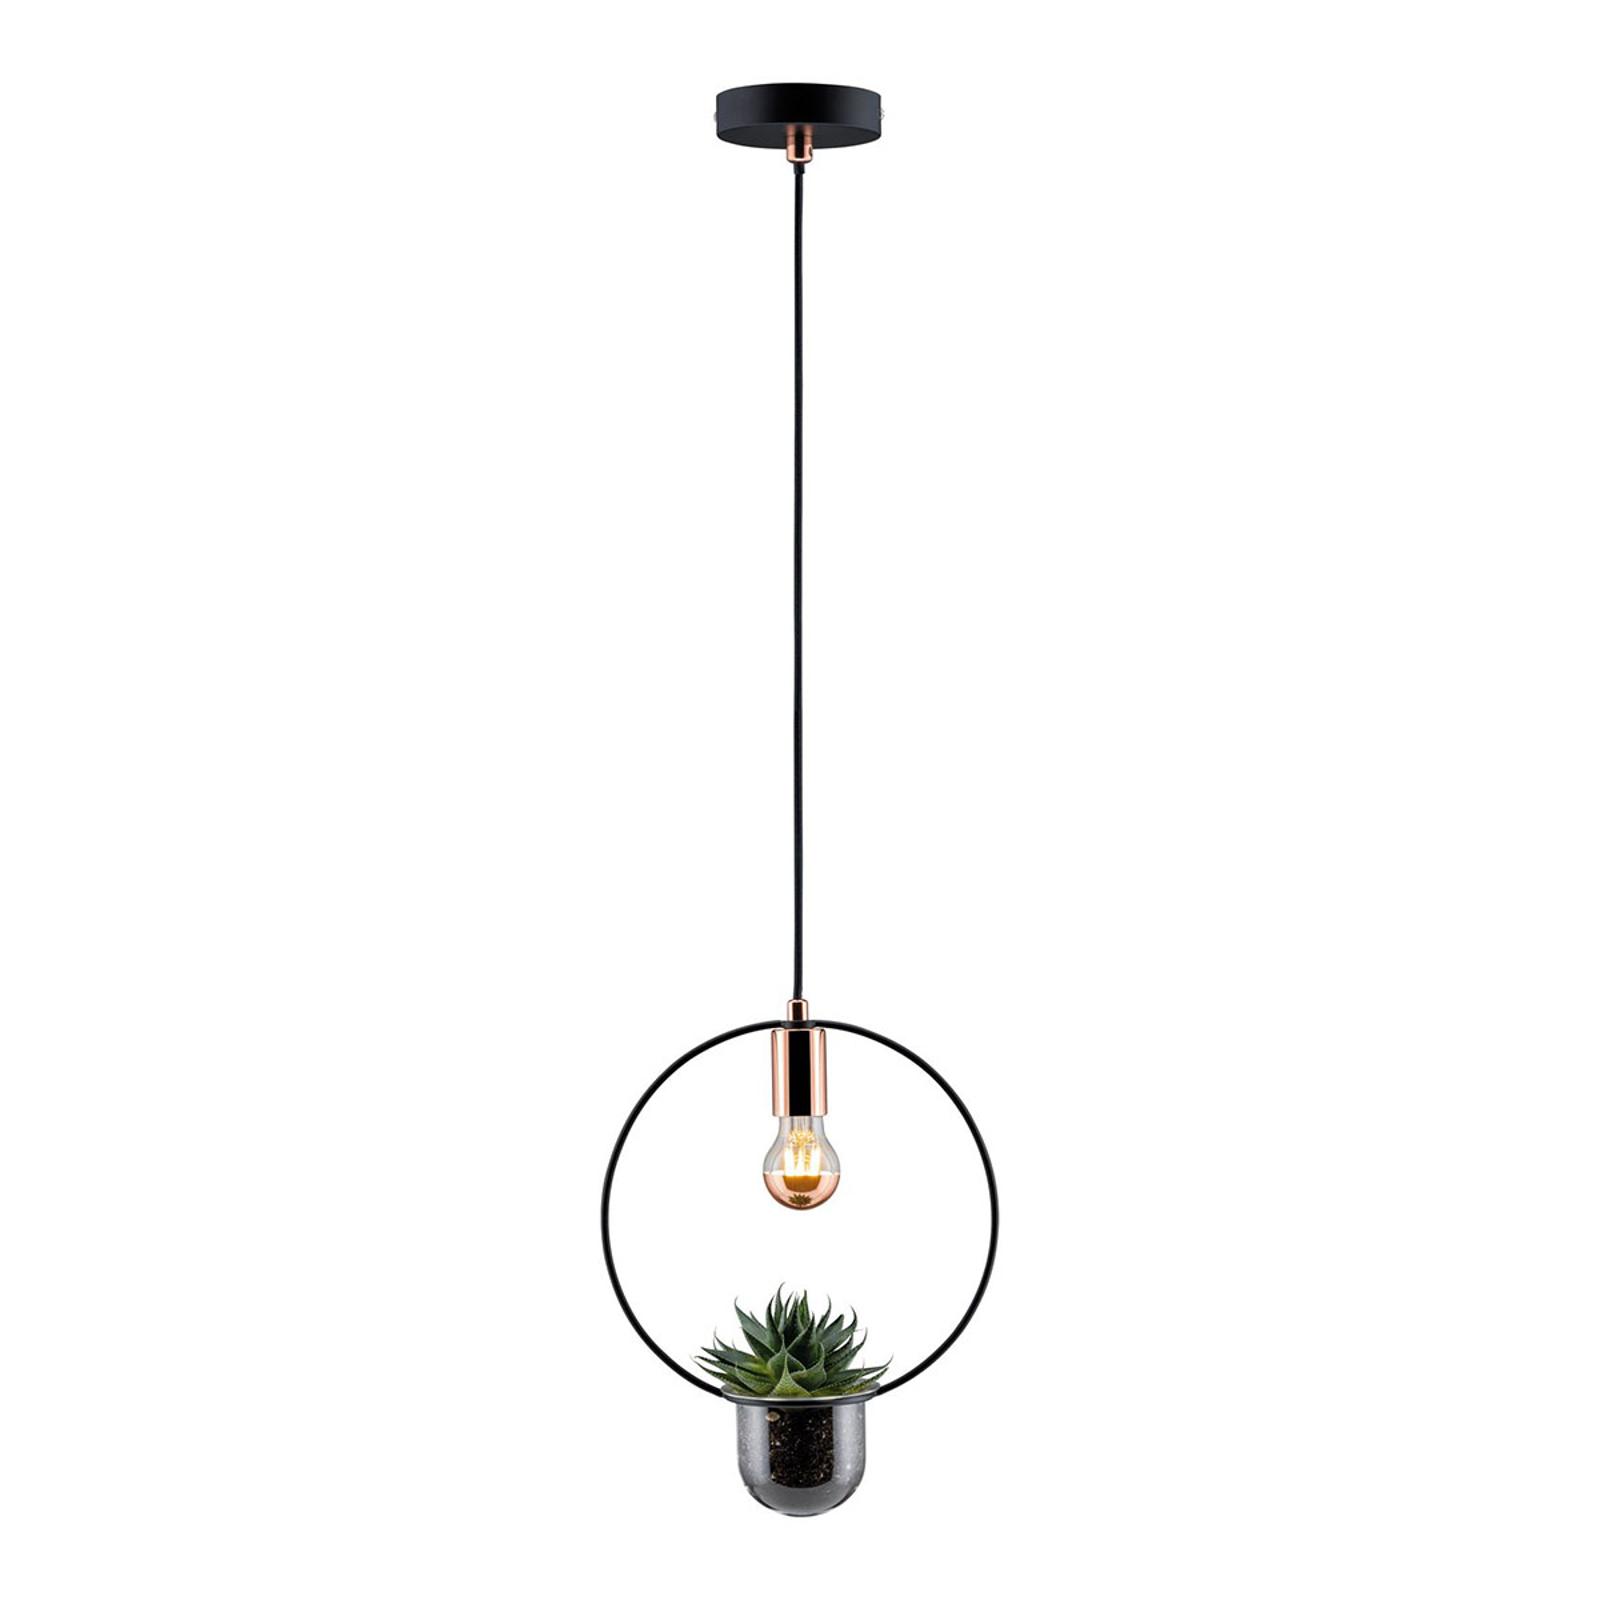 Paulmann suspension Tasja avec pot de fleur